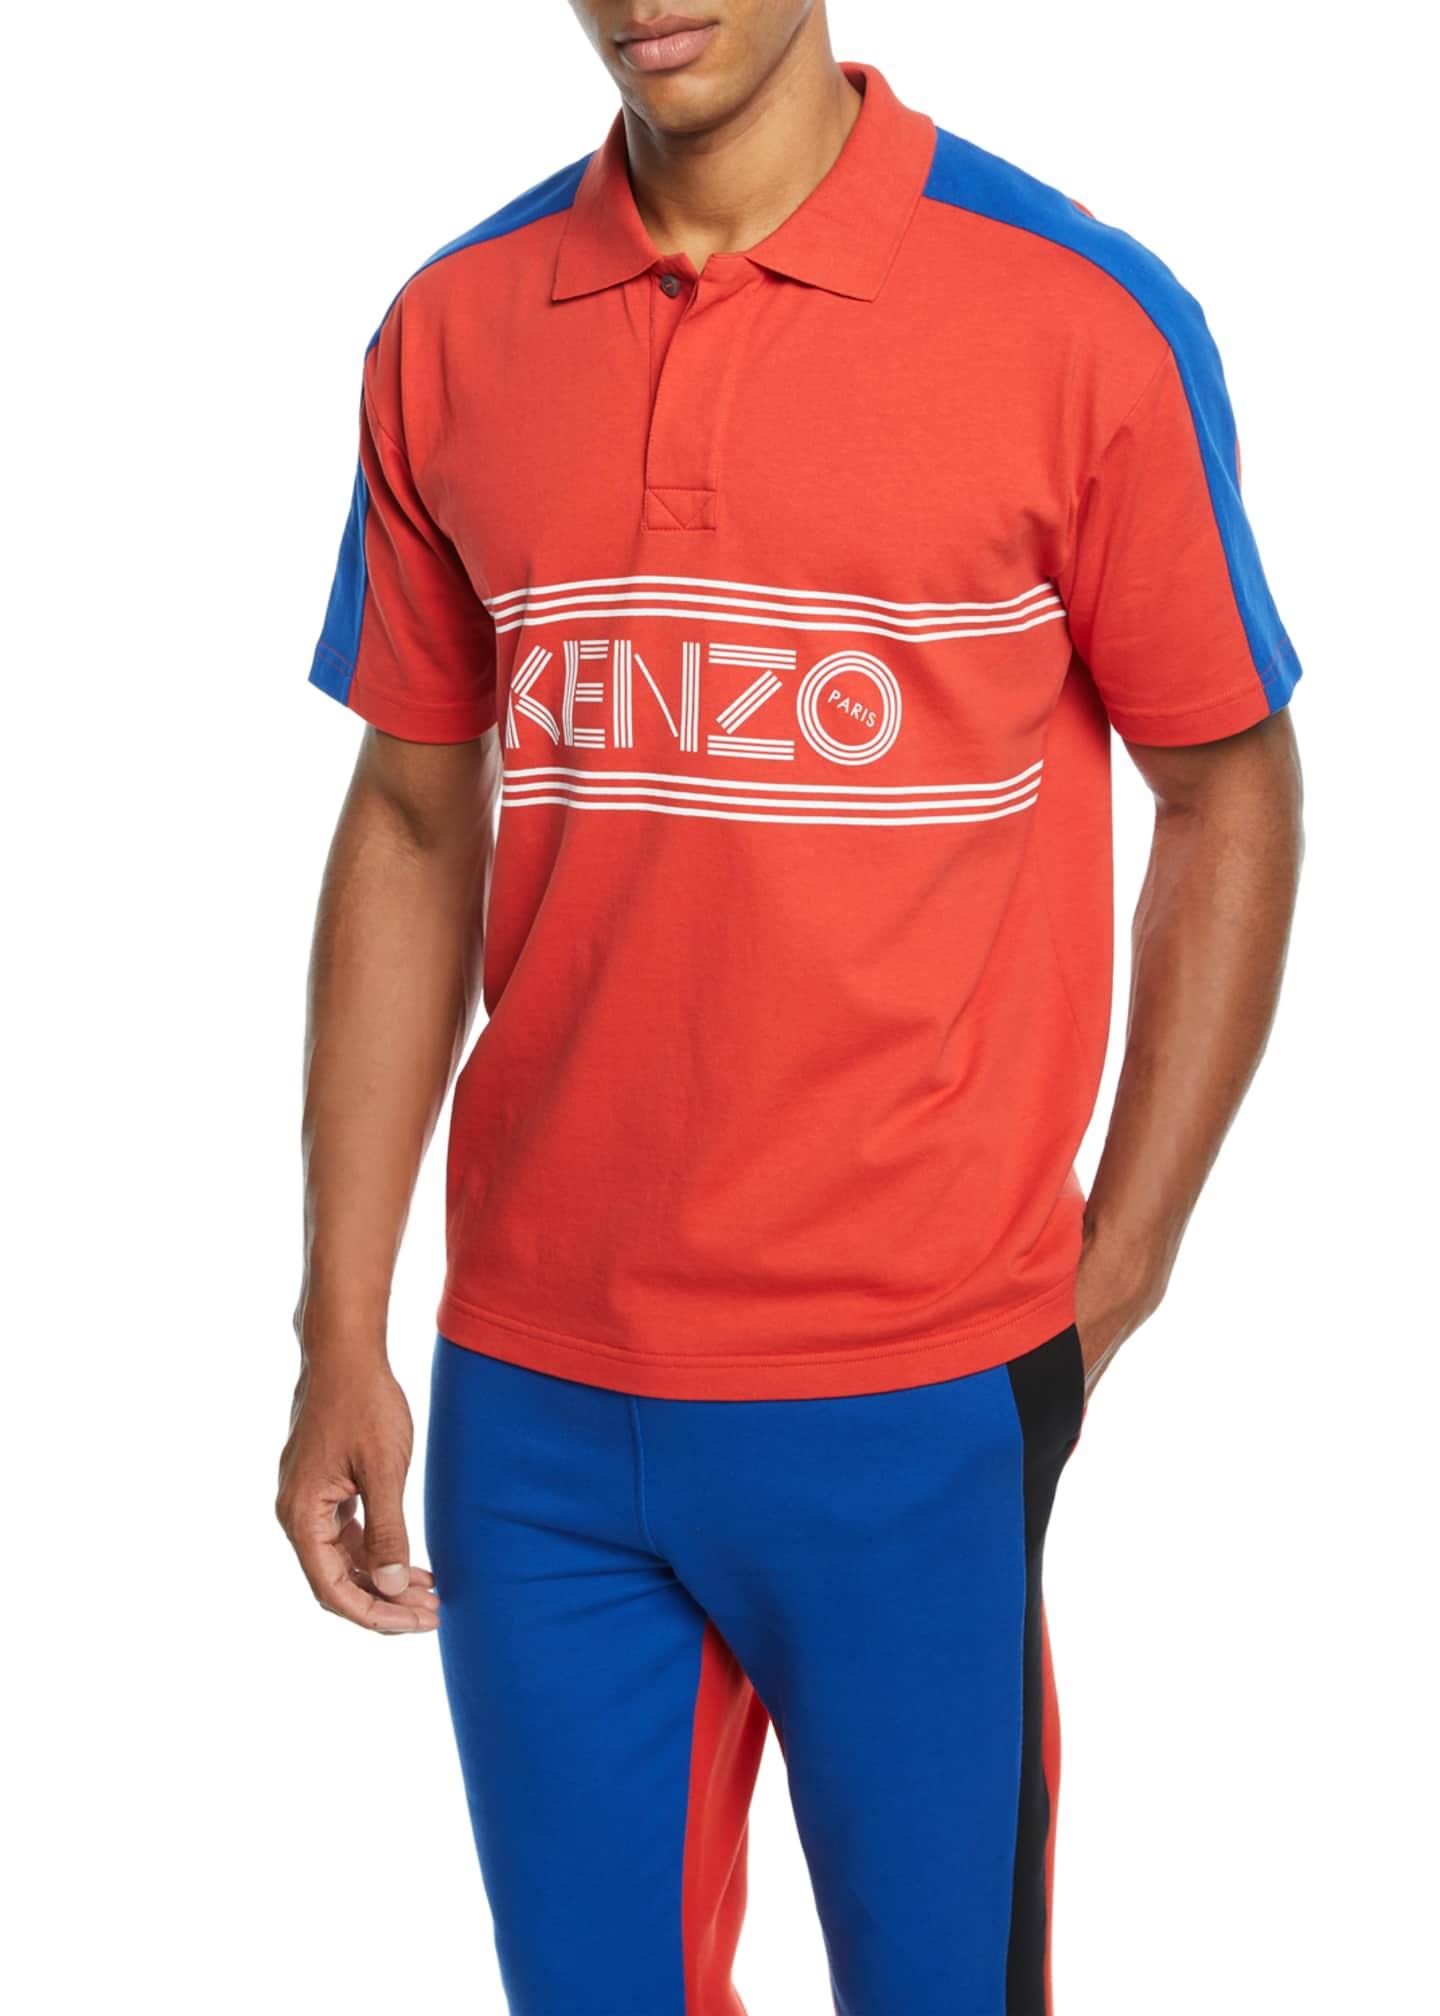 Kenzo Men's E Skate Colorblock Polo Shirt